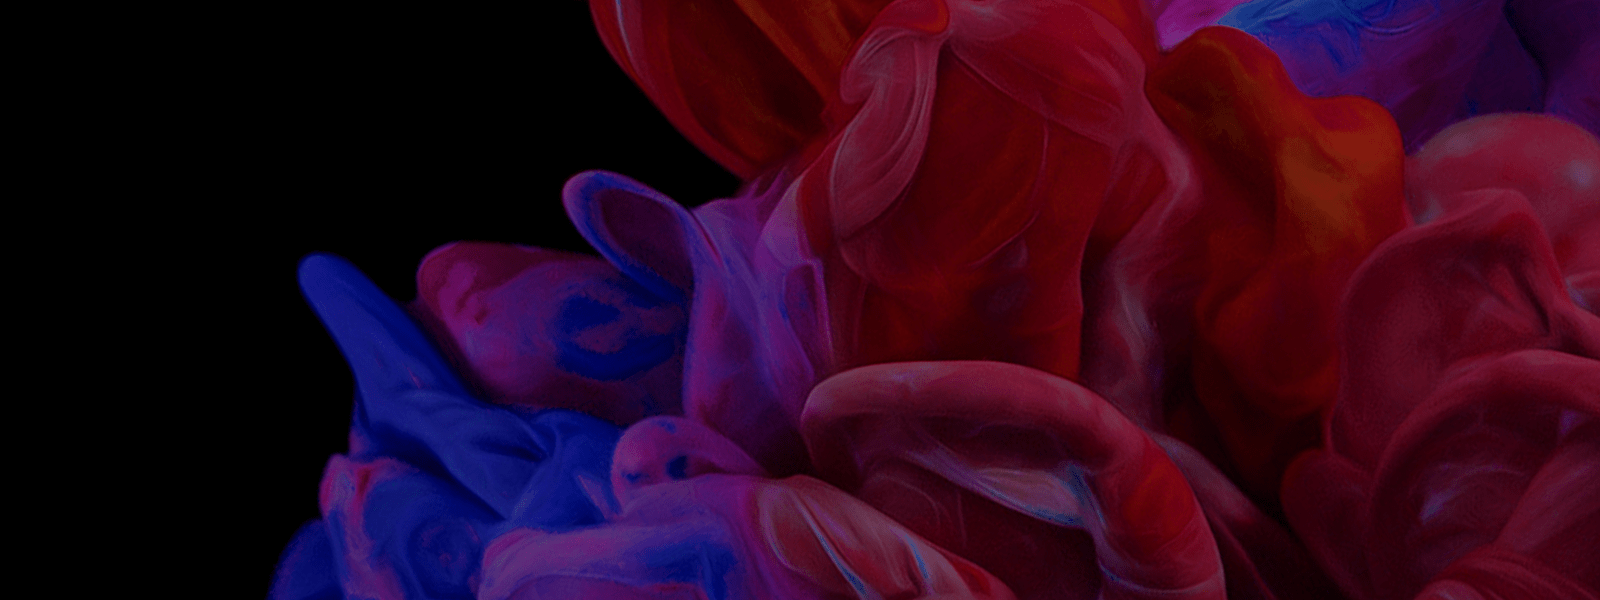 Background show artwork for Science Vs